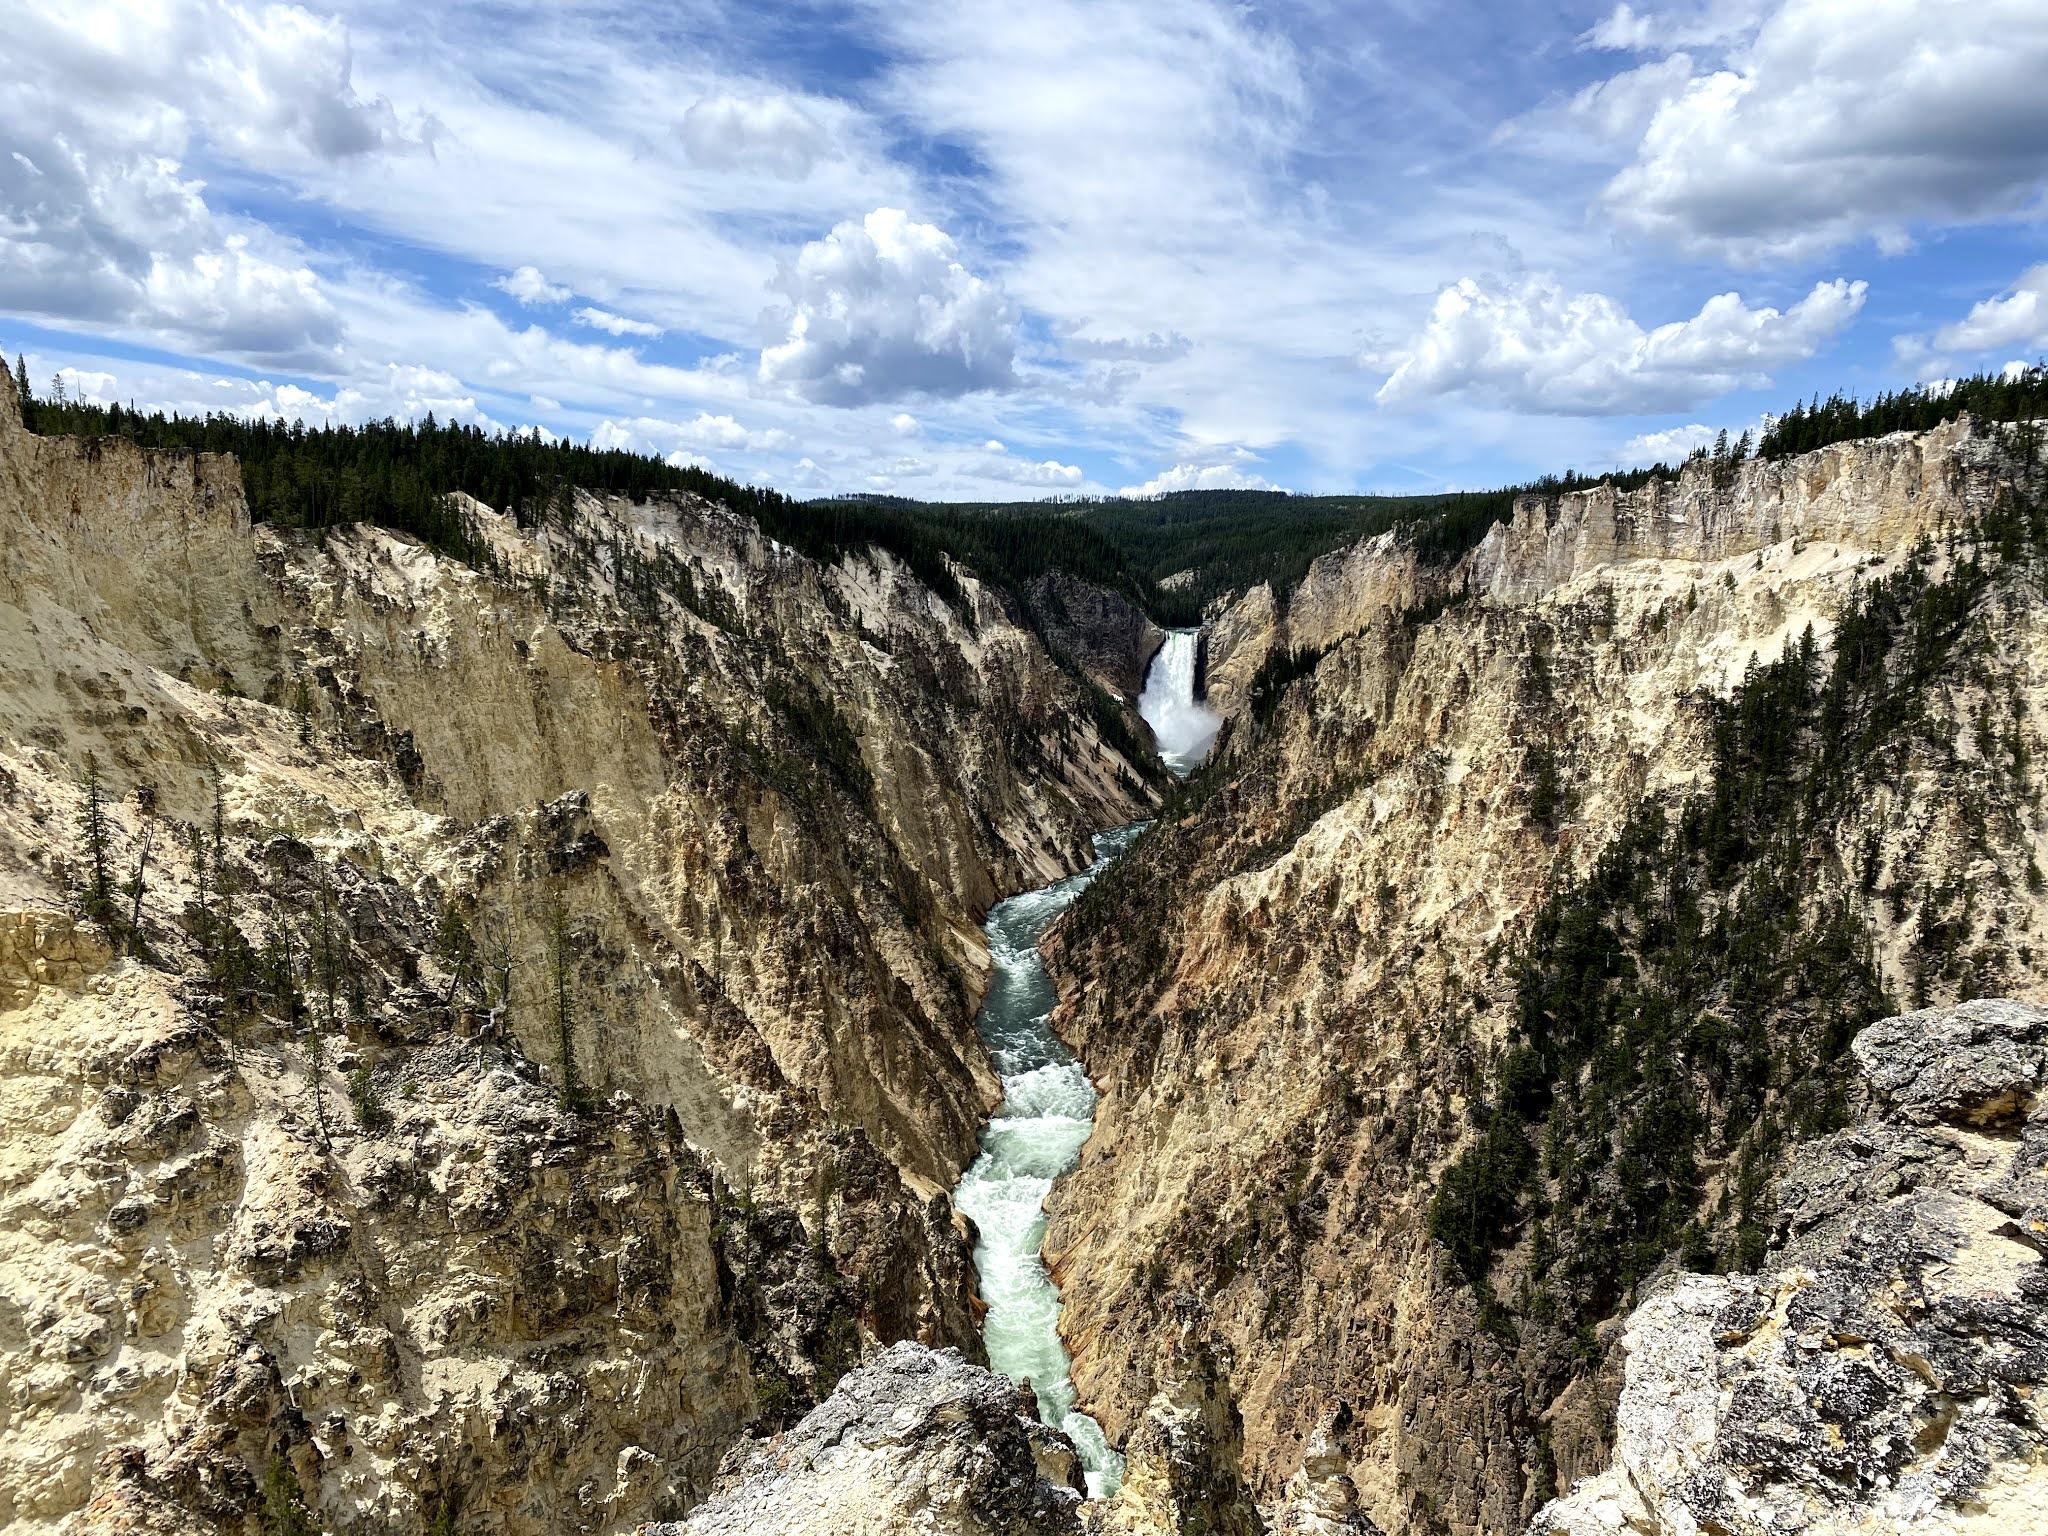 Waterfall at Yellowstone National Park | Biblio-style.com